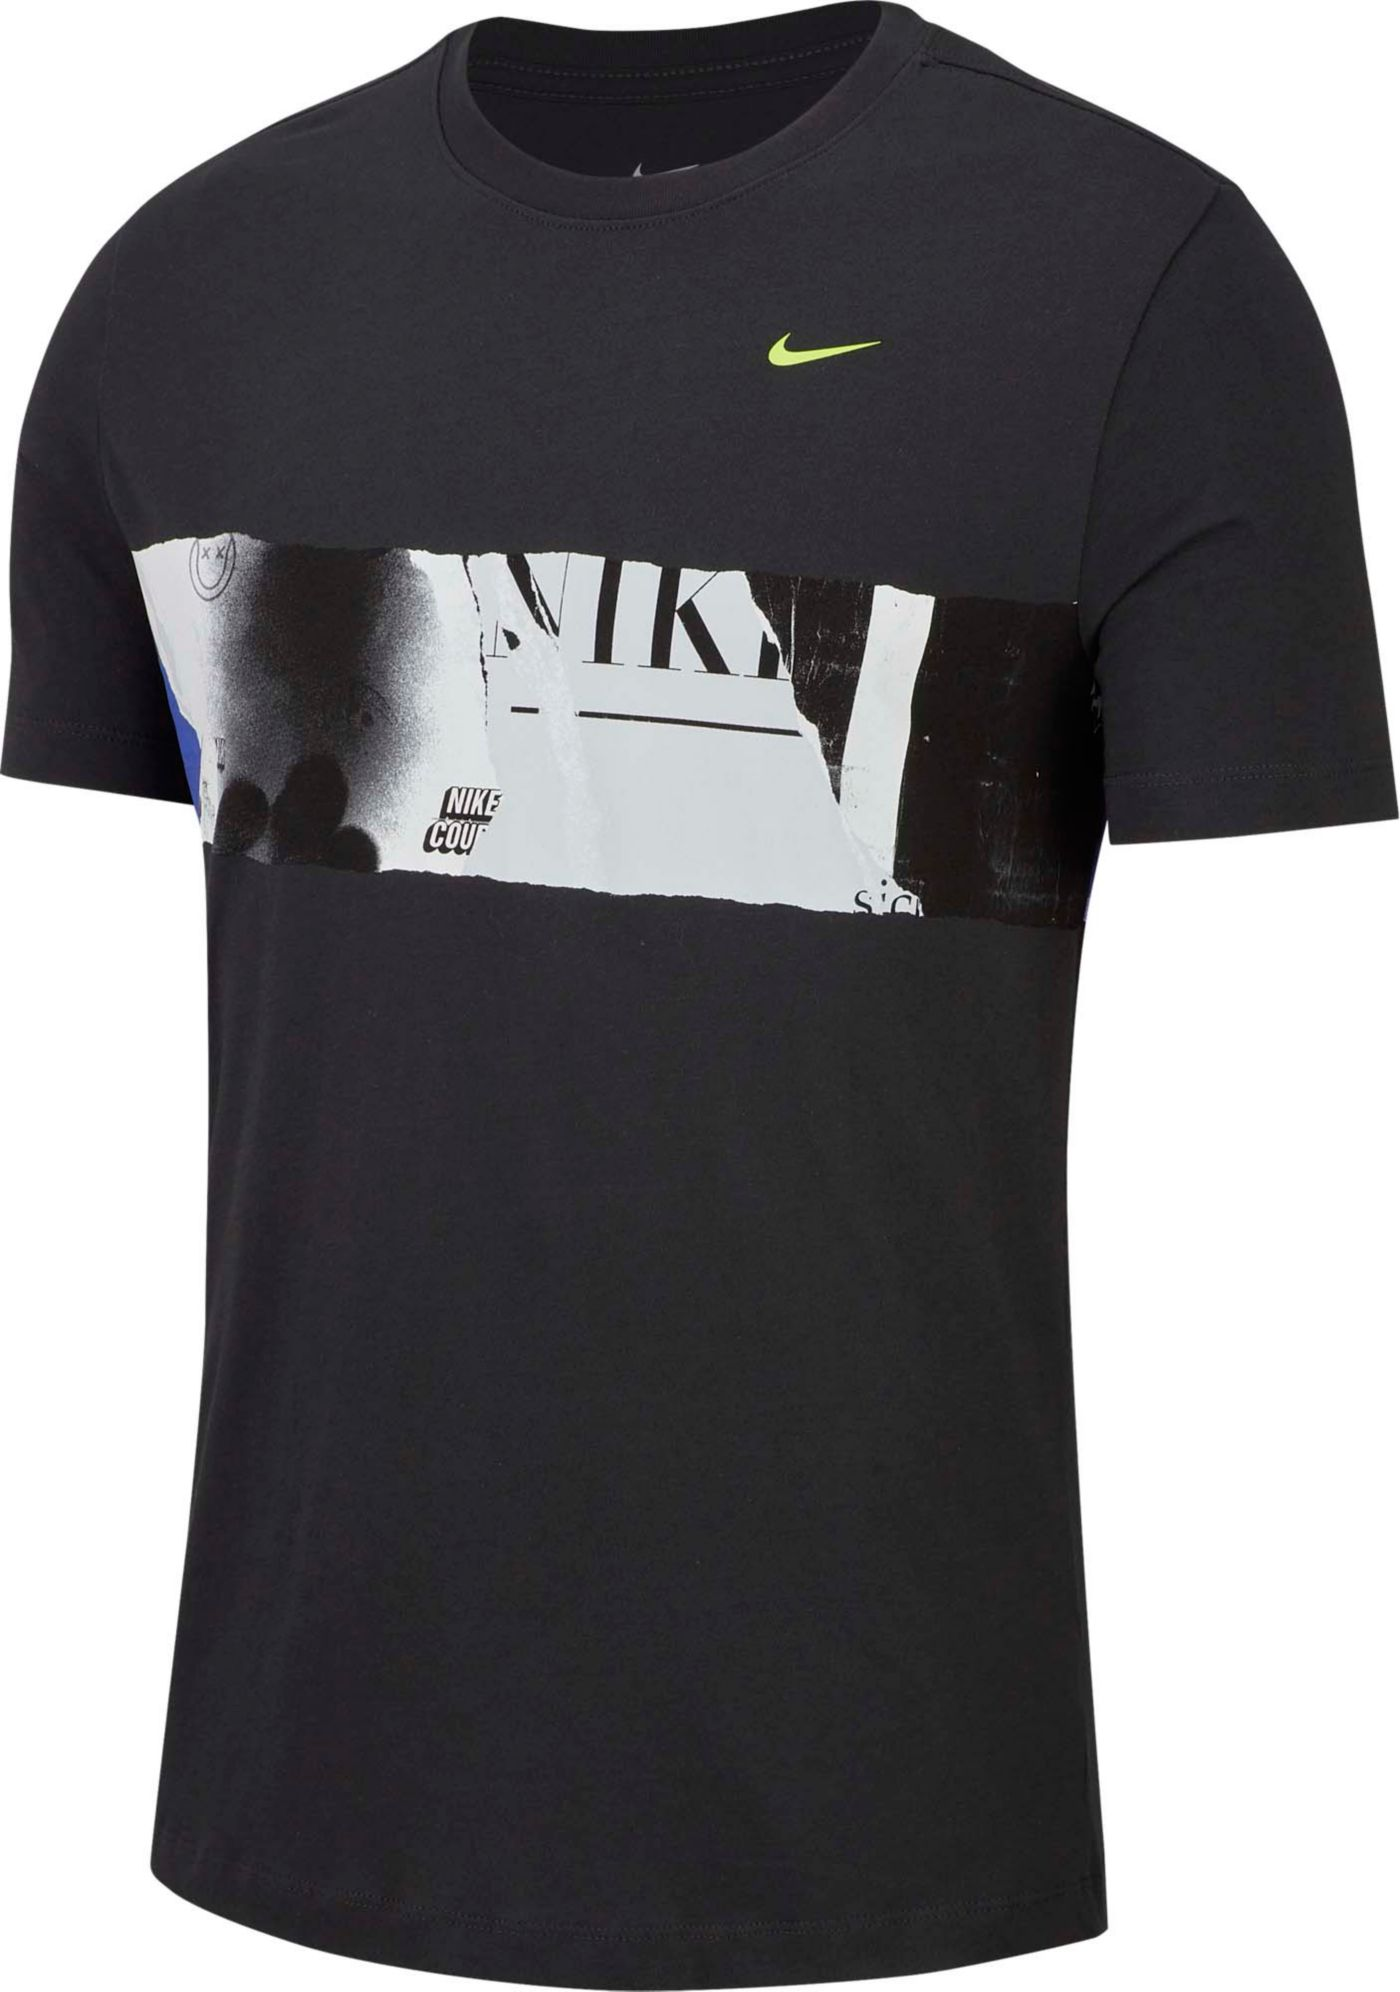 Nike Men's NikeCourt Graphic Tennis T-Shirt